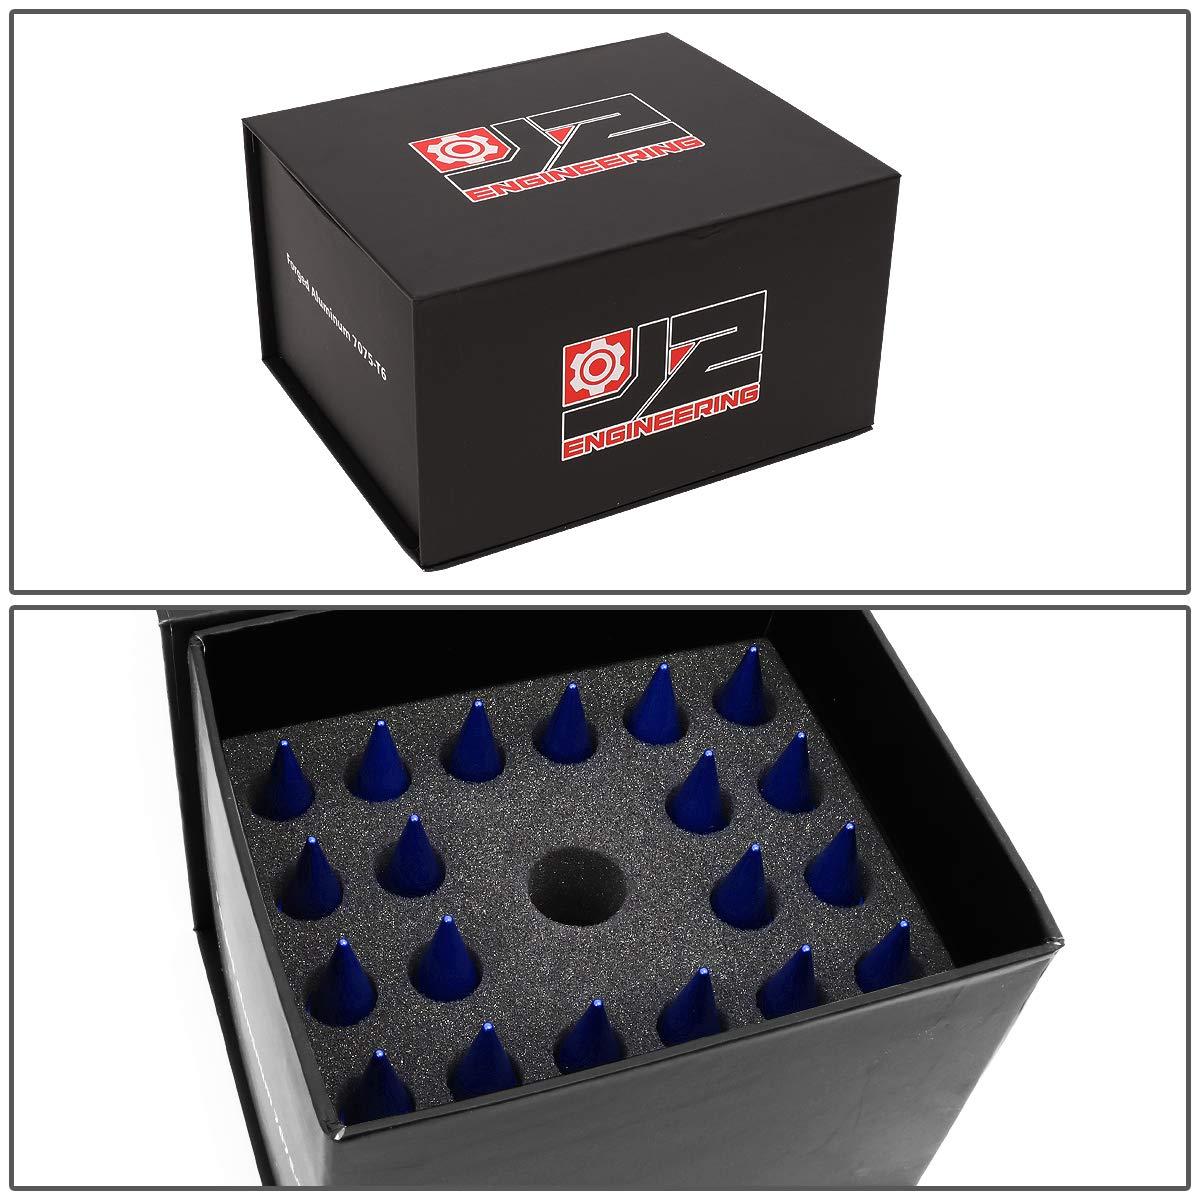 60mm Open End Lug Nut w//Socket Adapter J2 Engineering LN-T7-003-15-RD Red 7075 Aluminum M12X1.5 20Pcs L